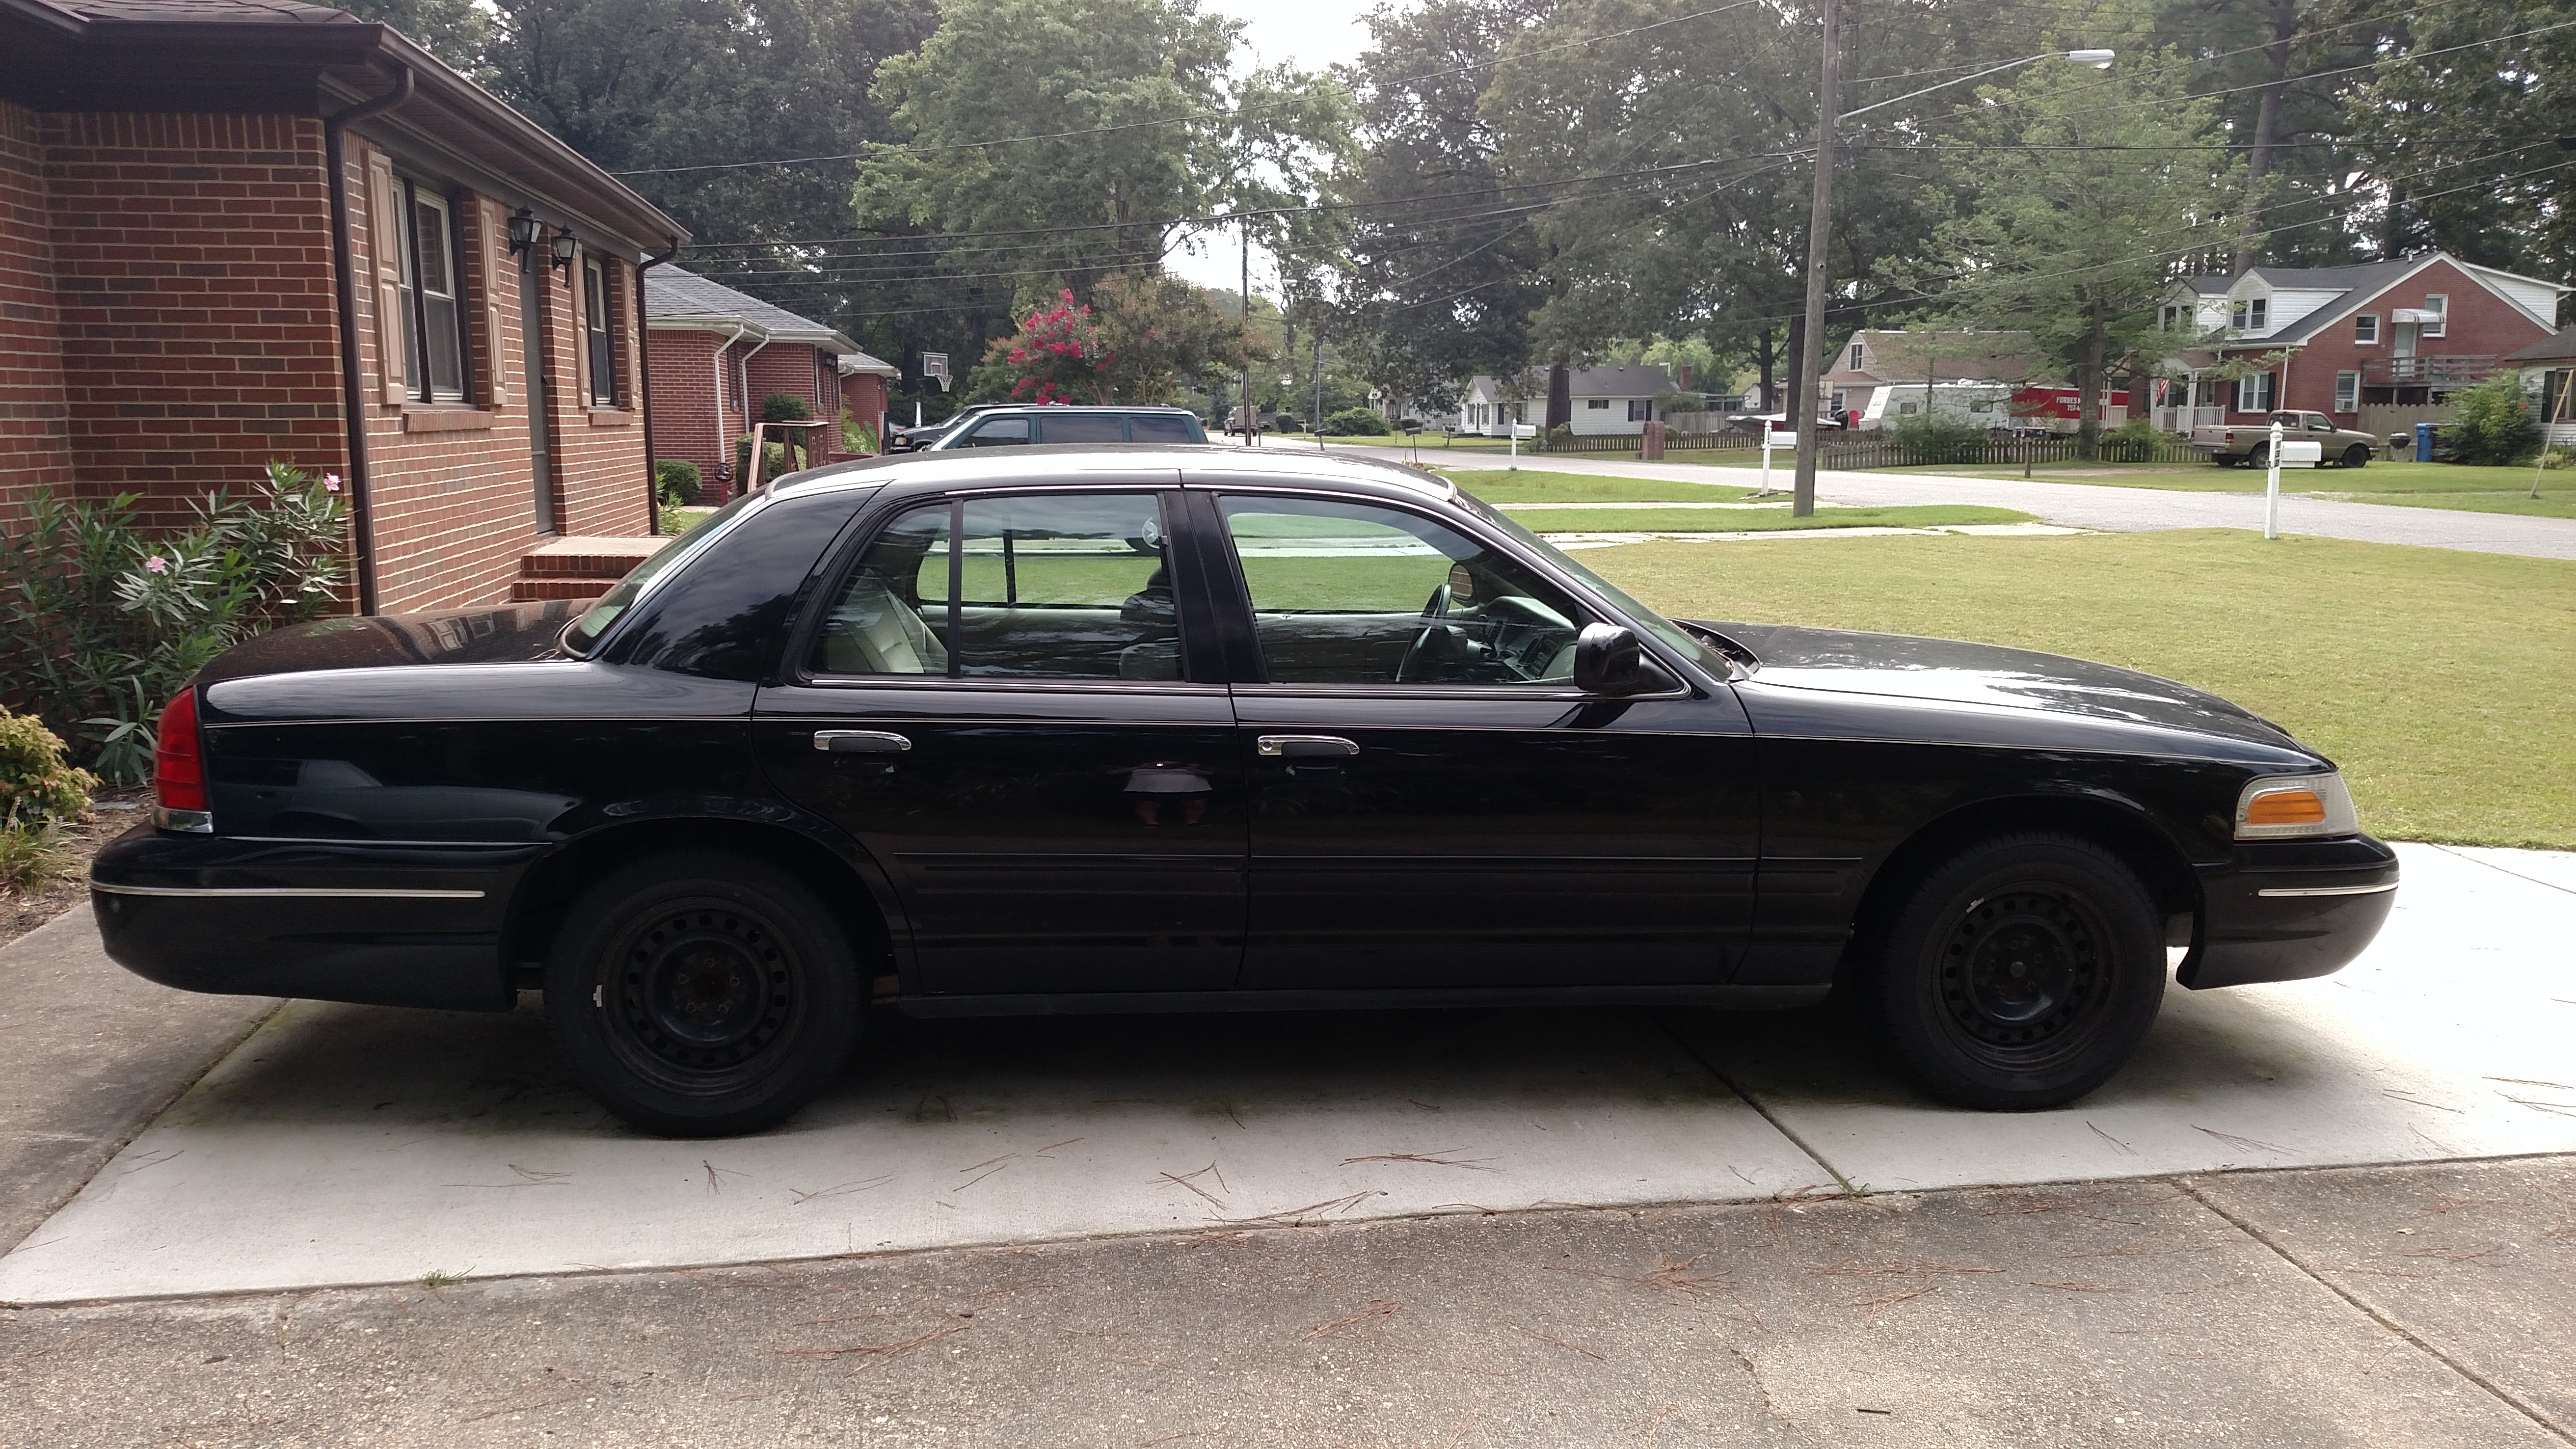 Buy Junk Cars Ri >> Cash for Cars Newport, RI | Sell Your Junk Car | The Clunker Junker